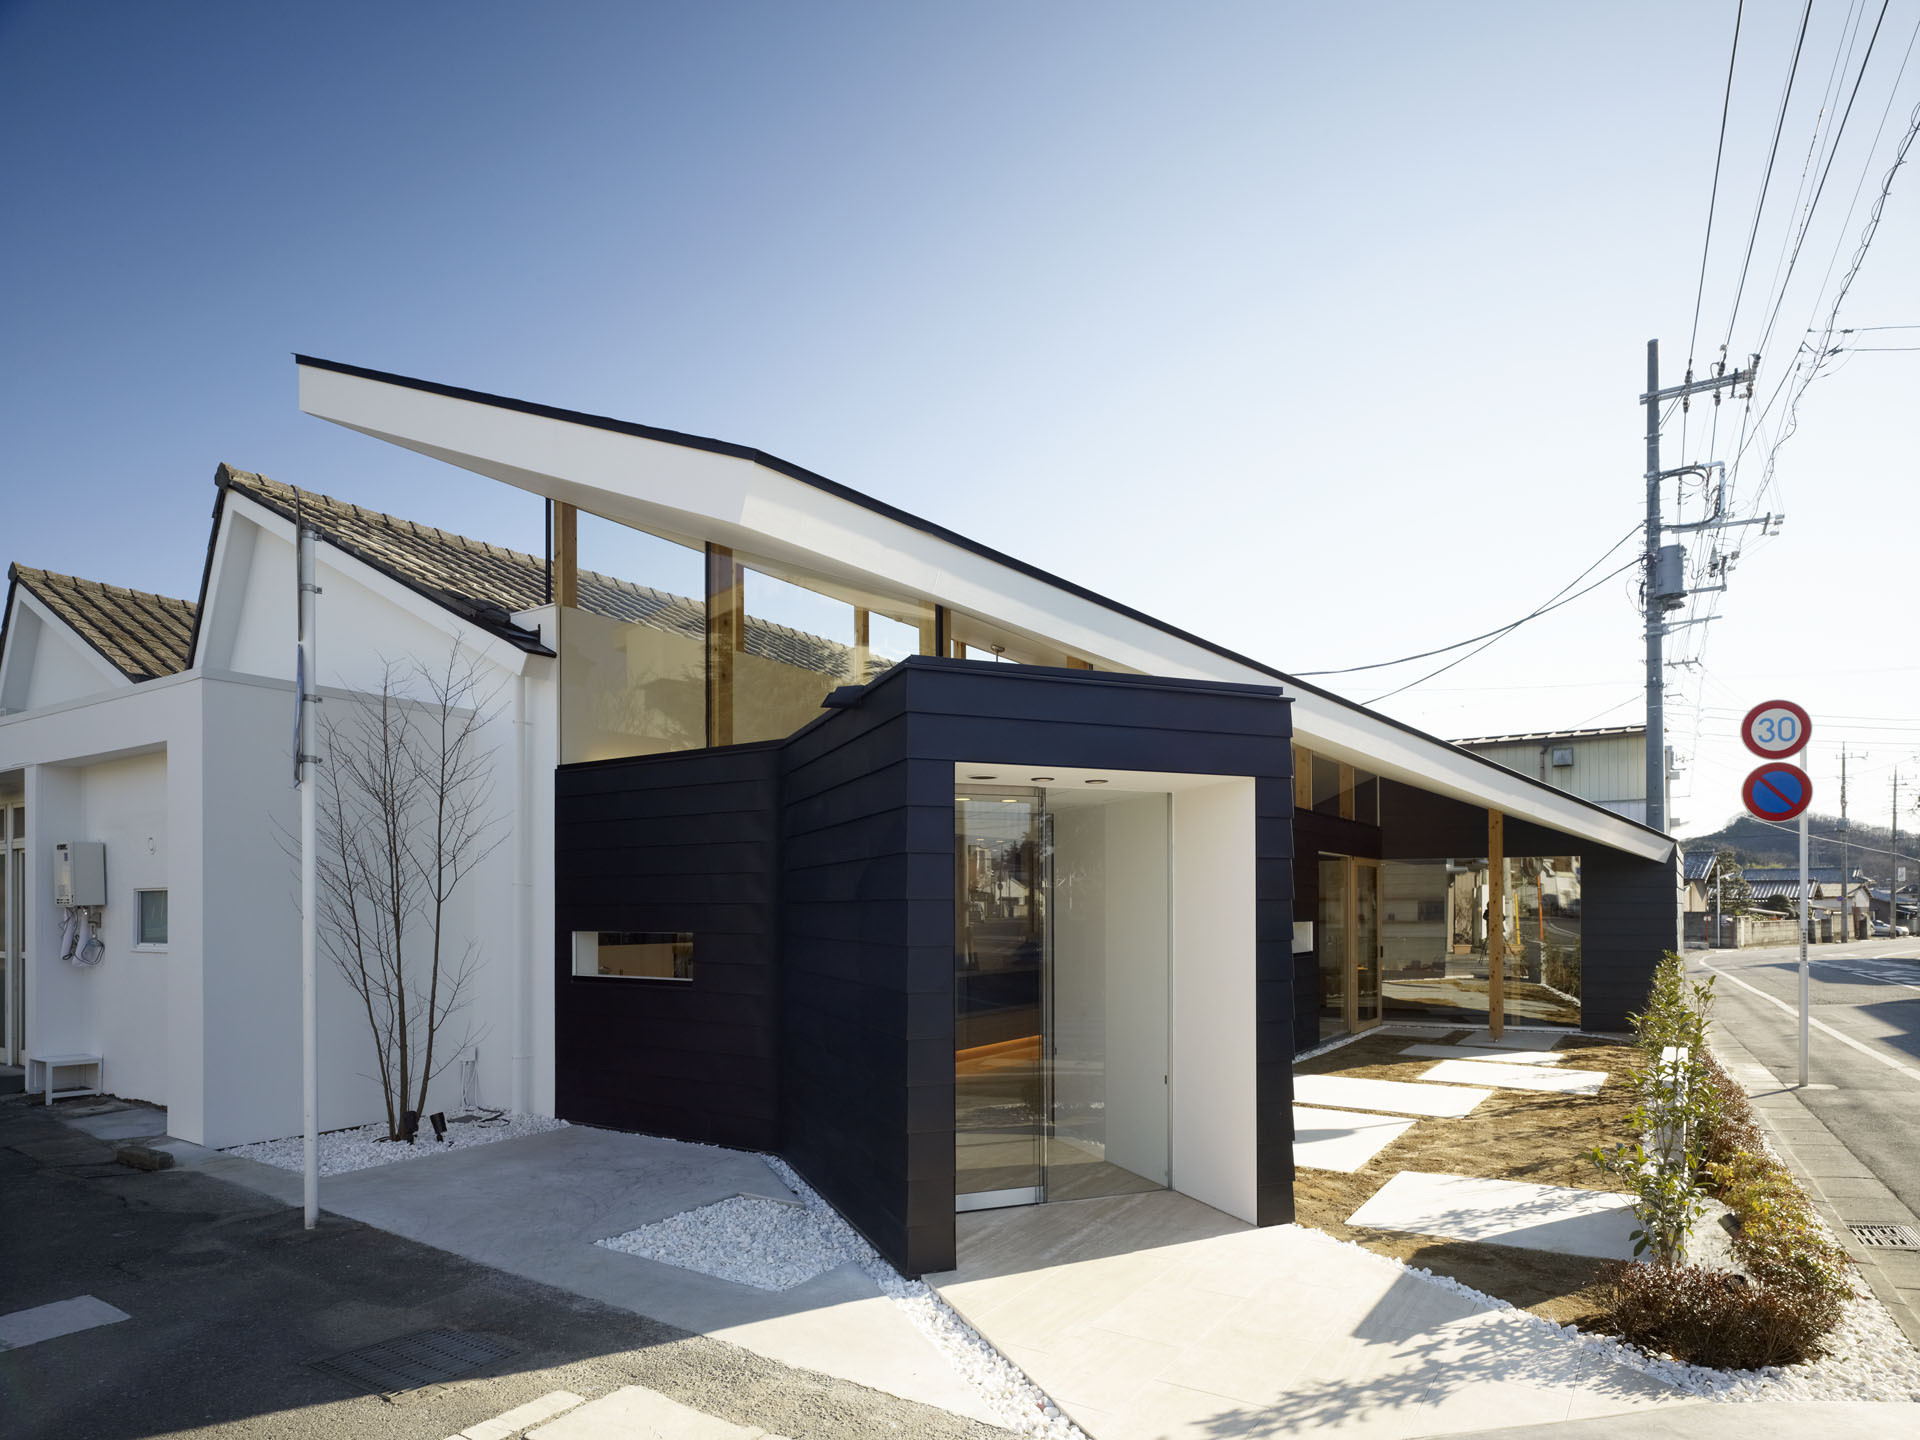 Patisserie Uchiyama / Takato Tamagami, © Masaya Yoshimura